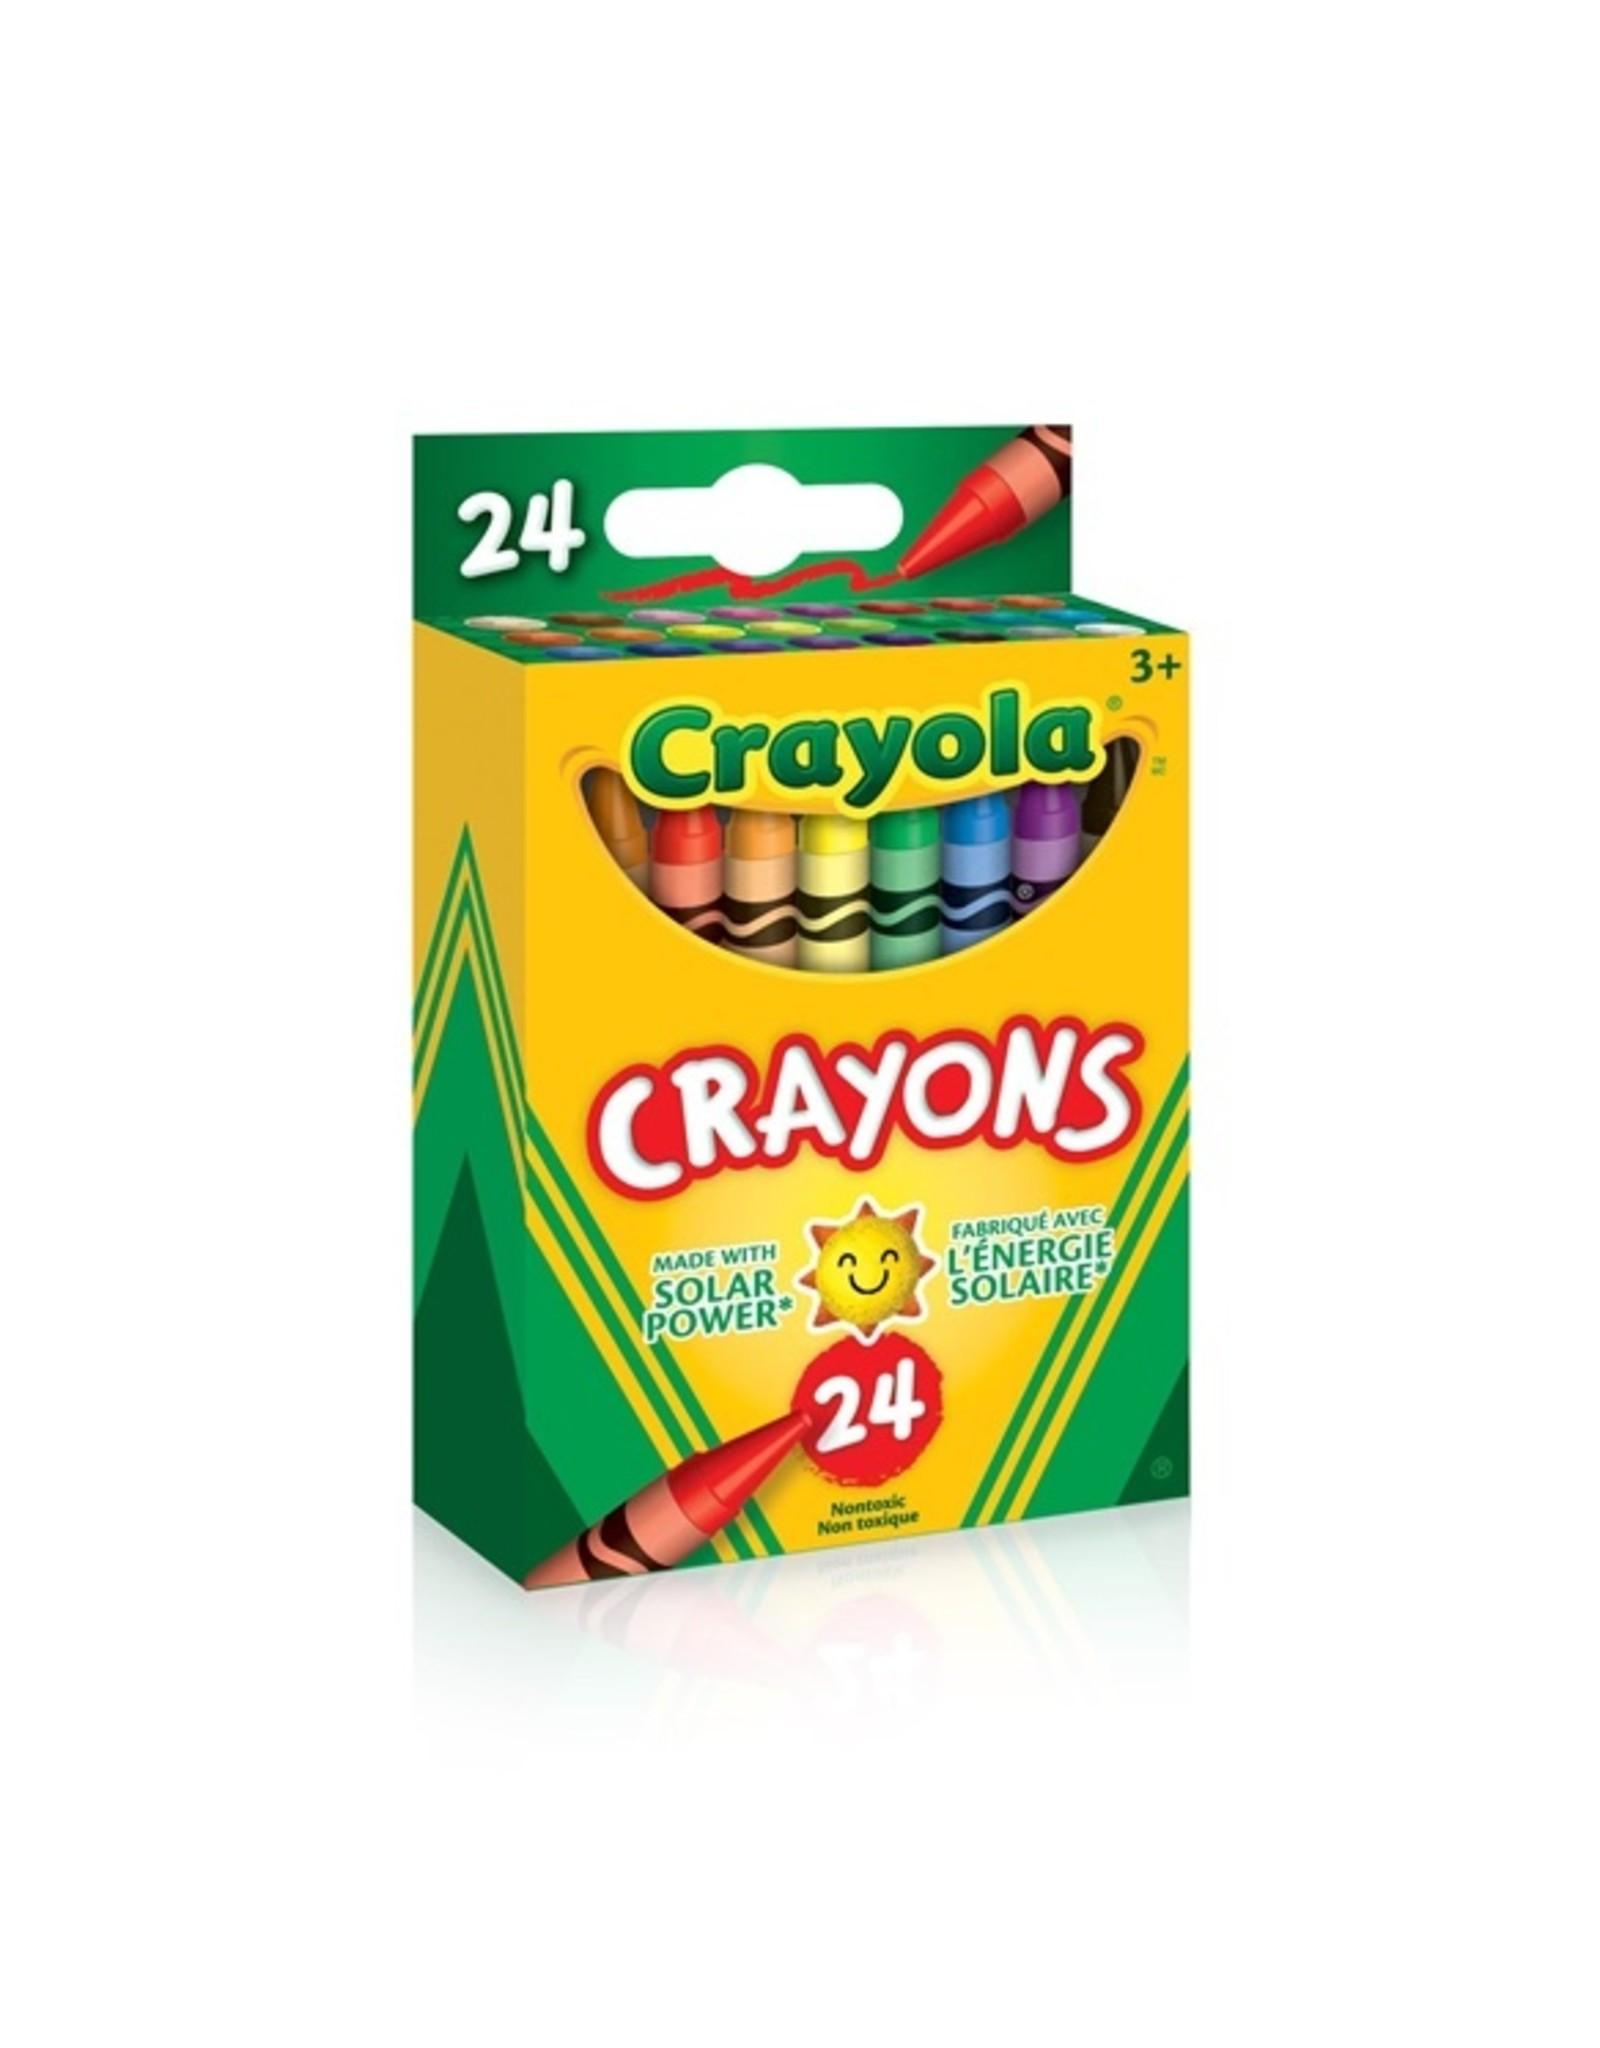 Crayola Crayons, 24 CT - regular